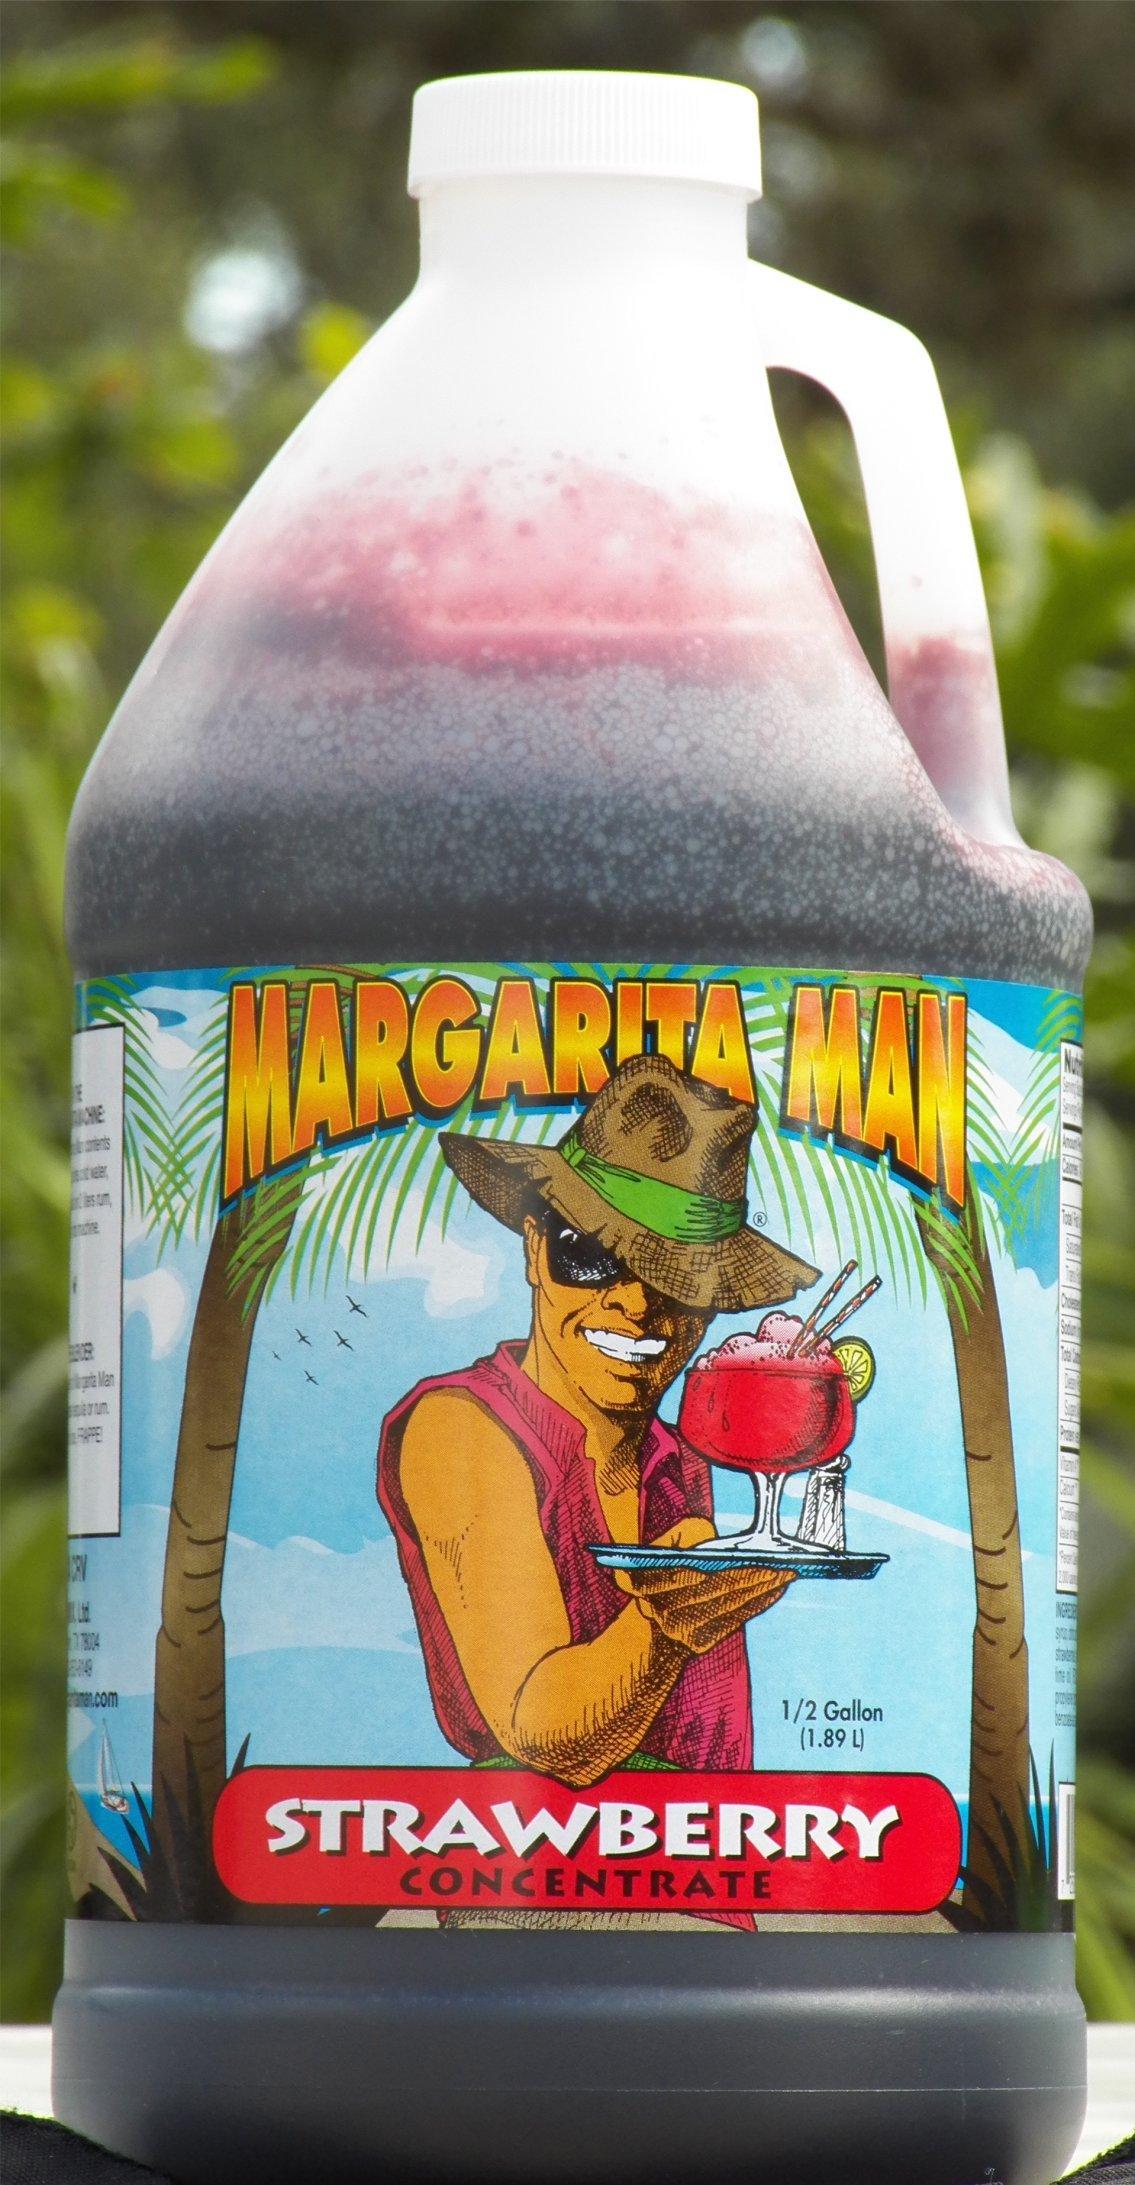 Margarita Man Strawberry Mix